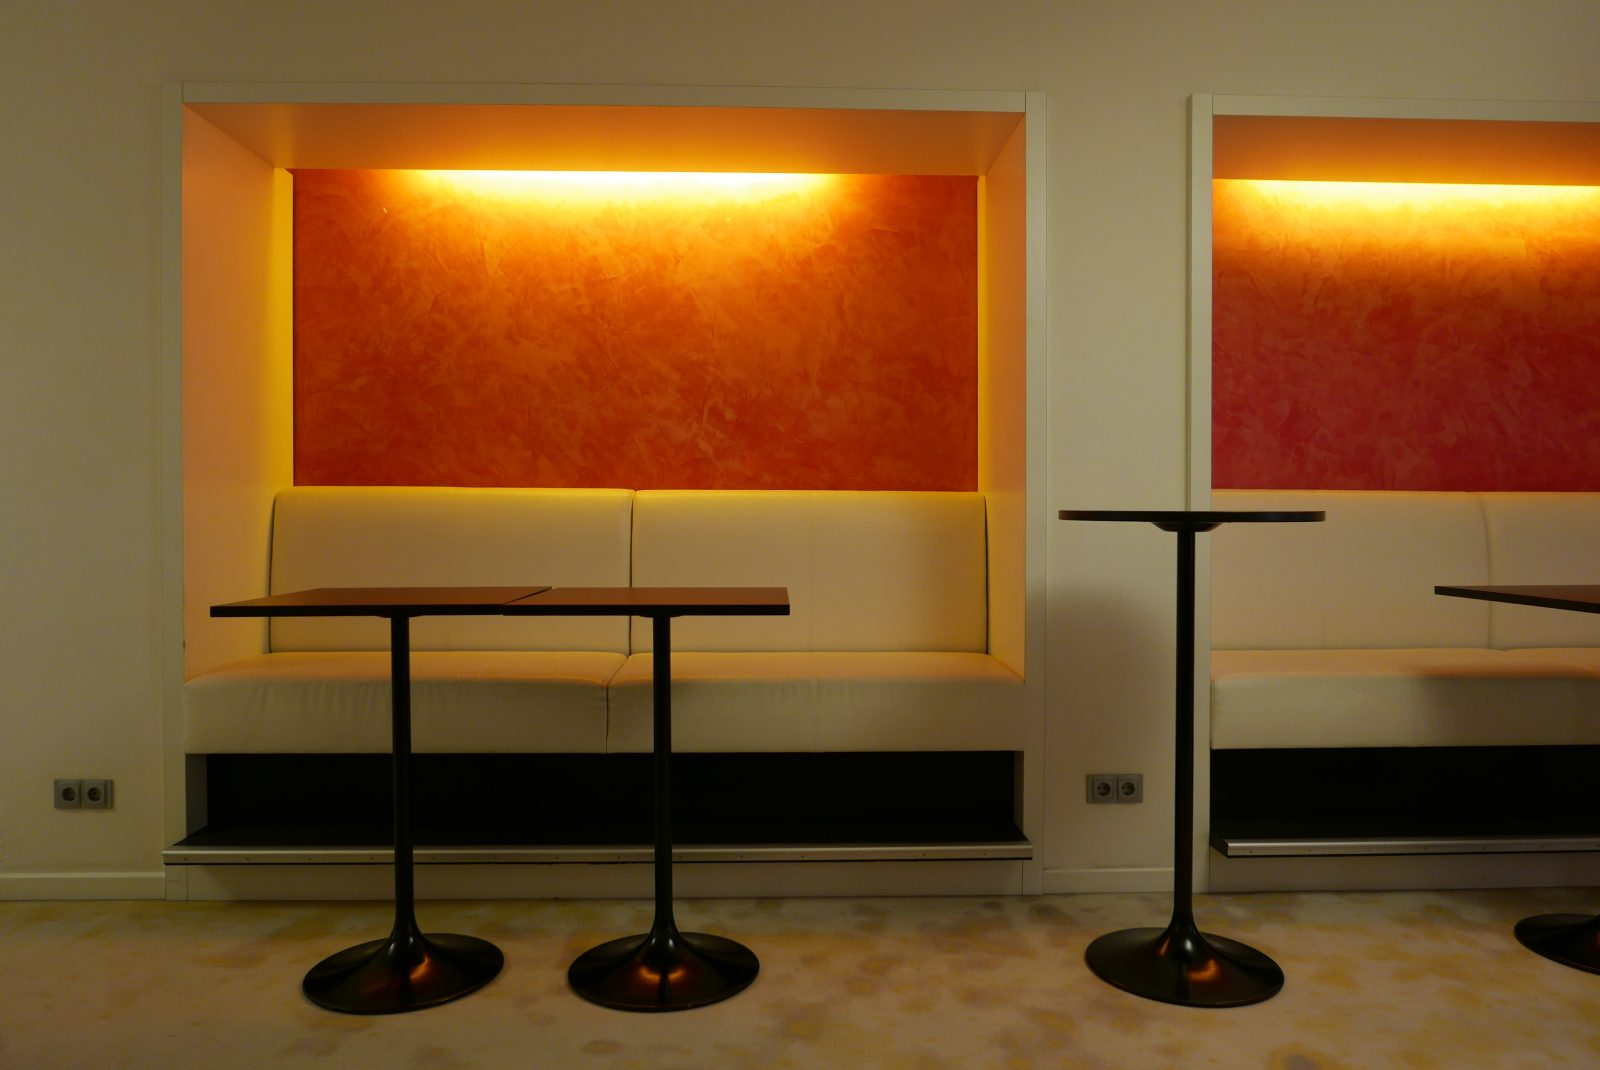 Umbau Hotel Berlin Berlin